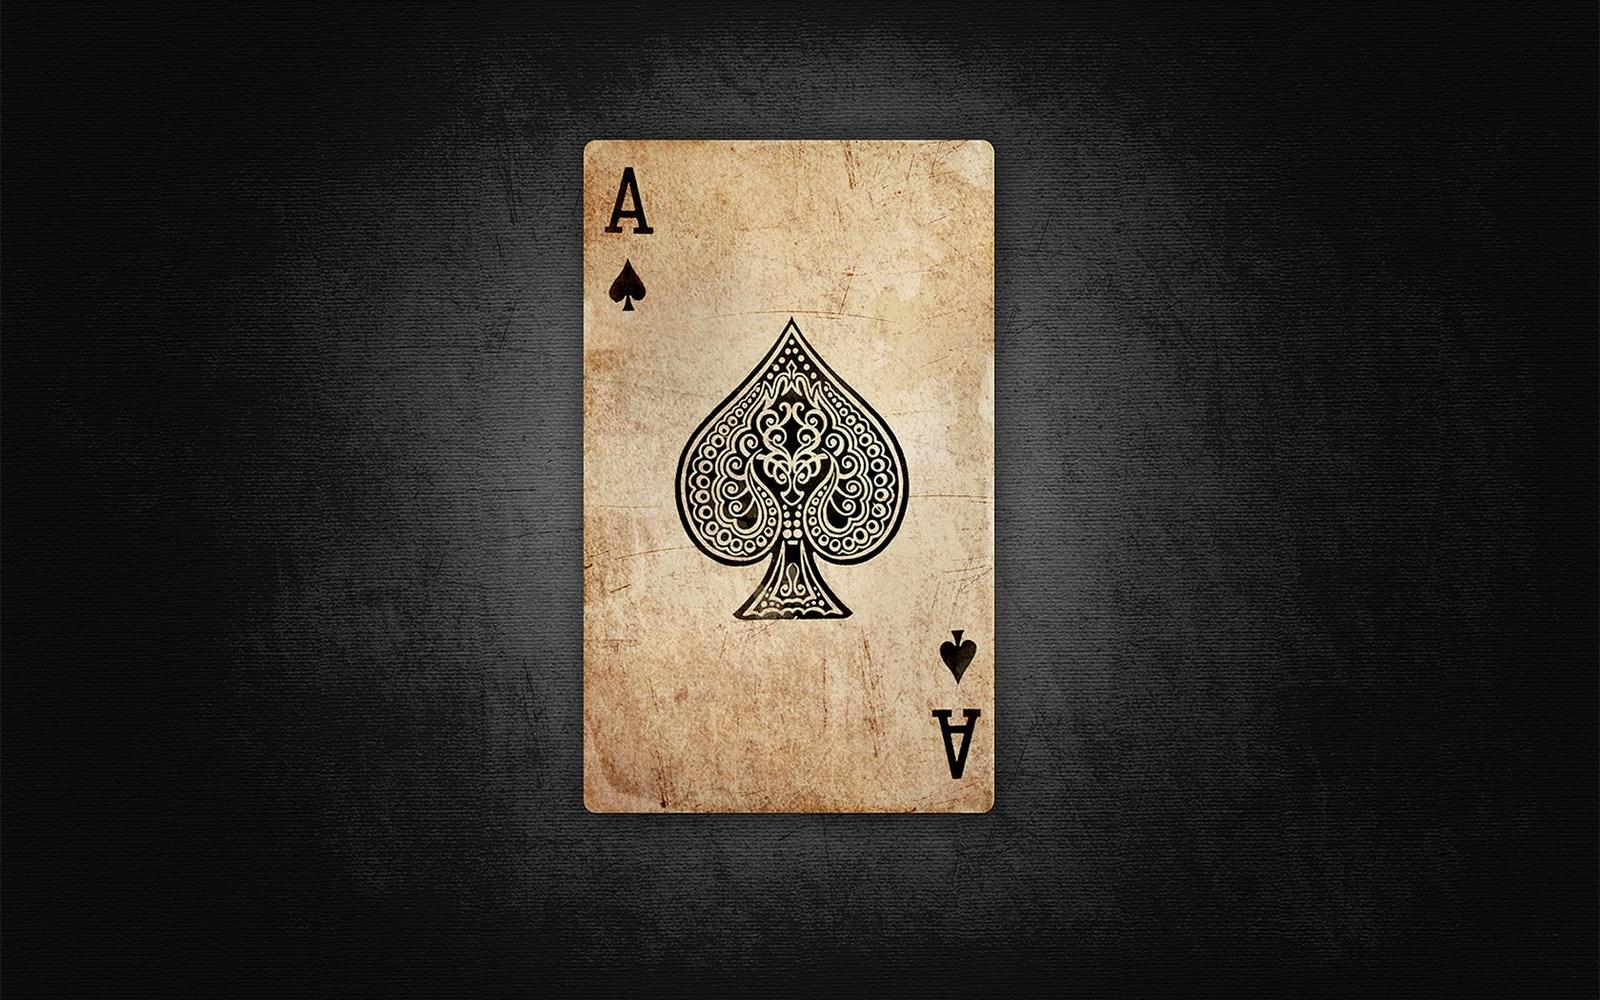 http://2.bp.blogspot.com/-AqxKhqKIeCI/TgXghvLw6kI/AAAAAAAACbY/42WJ8Pk0iCI/s1600/ace-of-spades-01.jpg